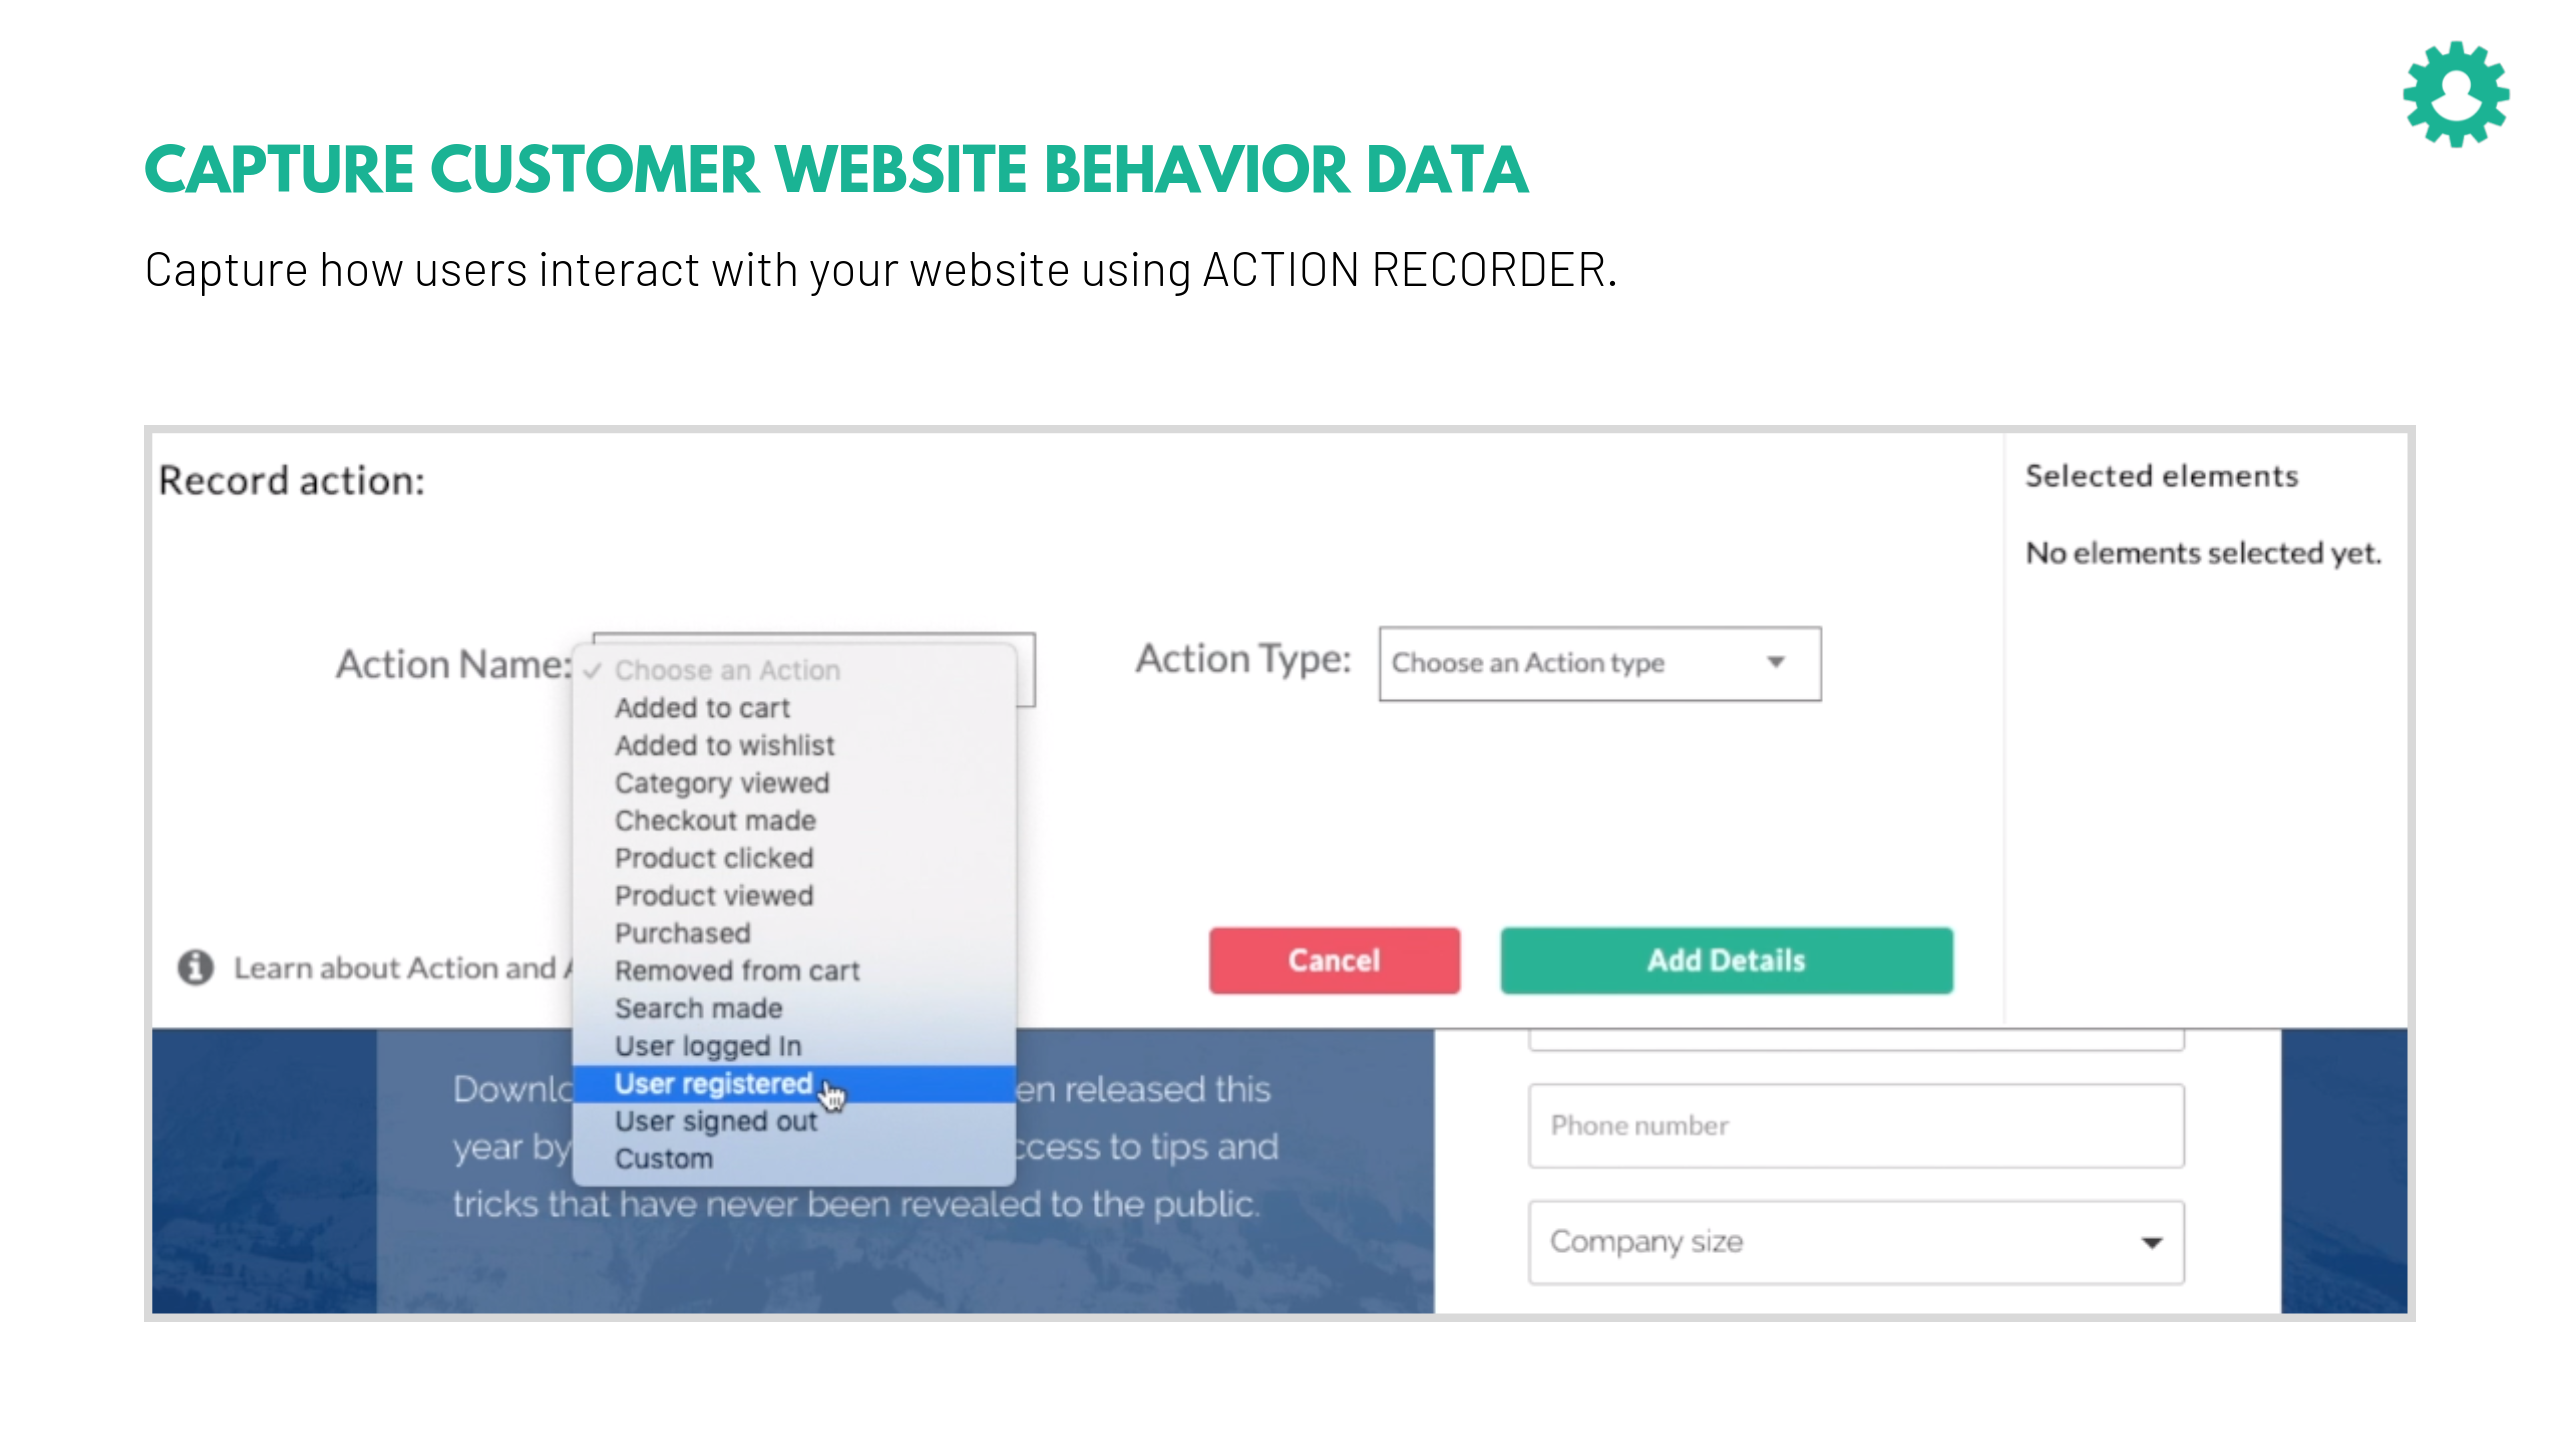 CustomerLabs CDP screenshot: Capture website visitor behavior using Action Recorder